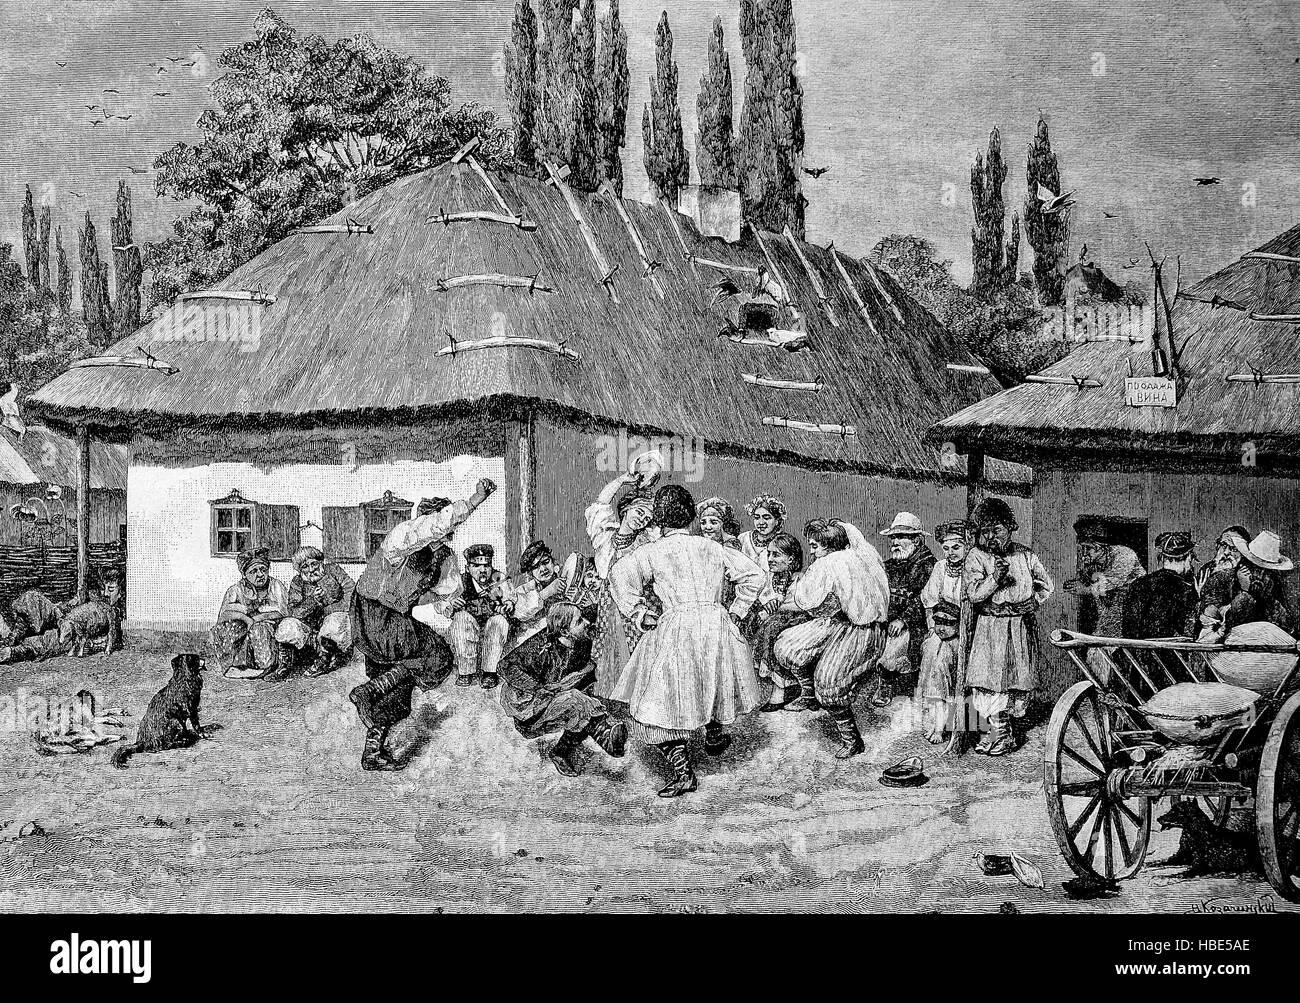 Hopak, also Gopak or Cossack dance, is a Ukrainian dance, Ukraine, Russia, illustration, woodcut from 1880 - Stock Image